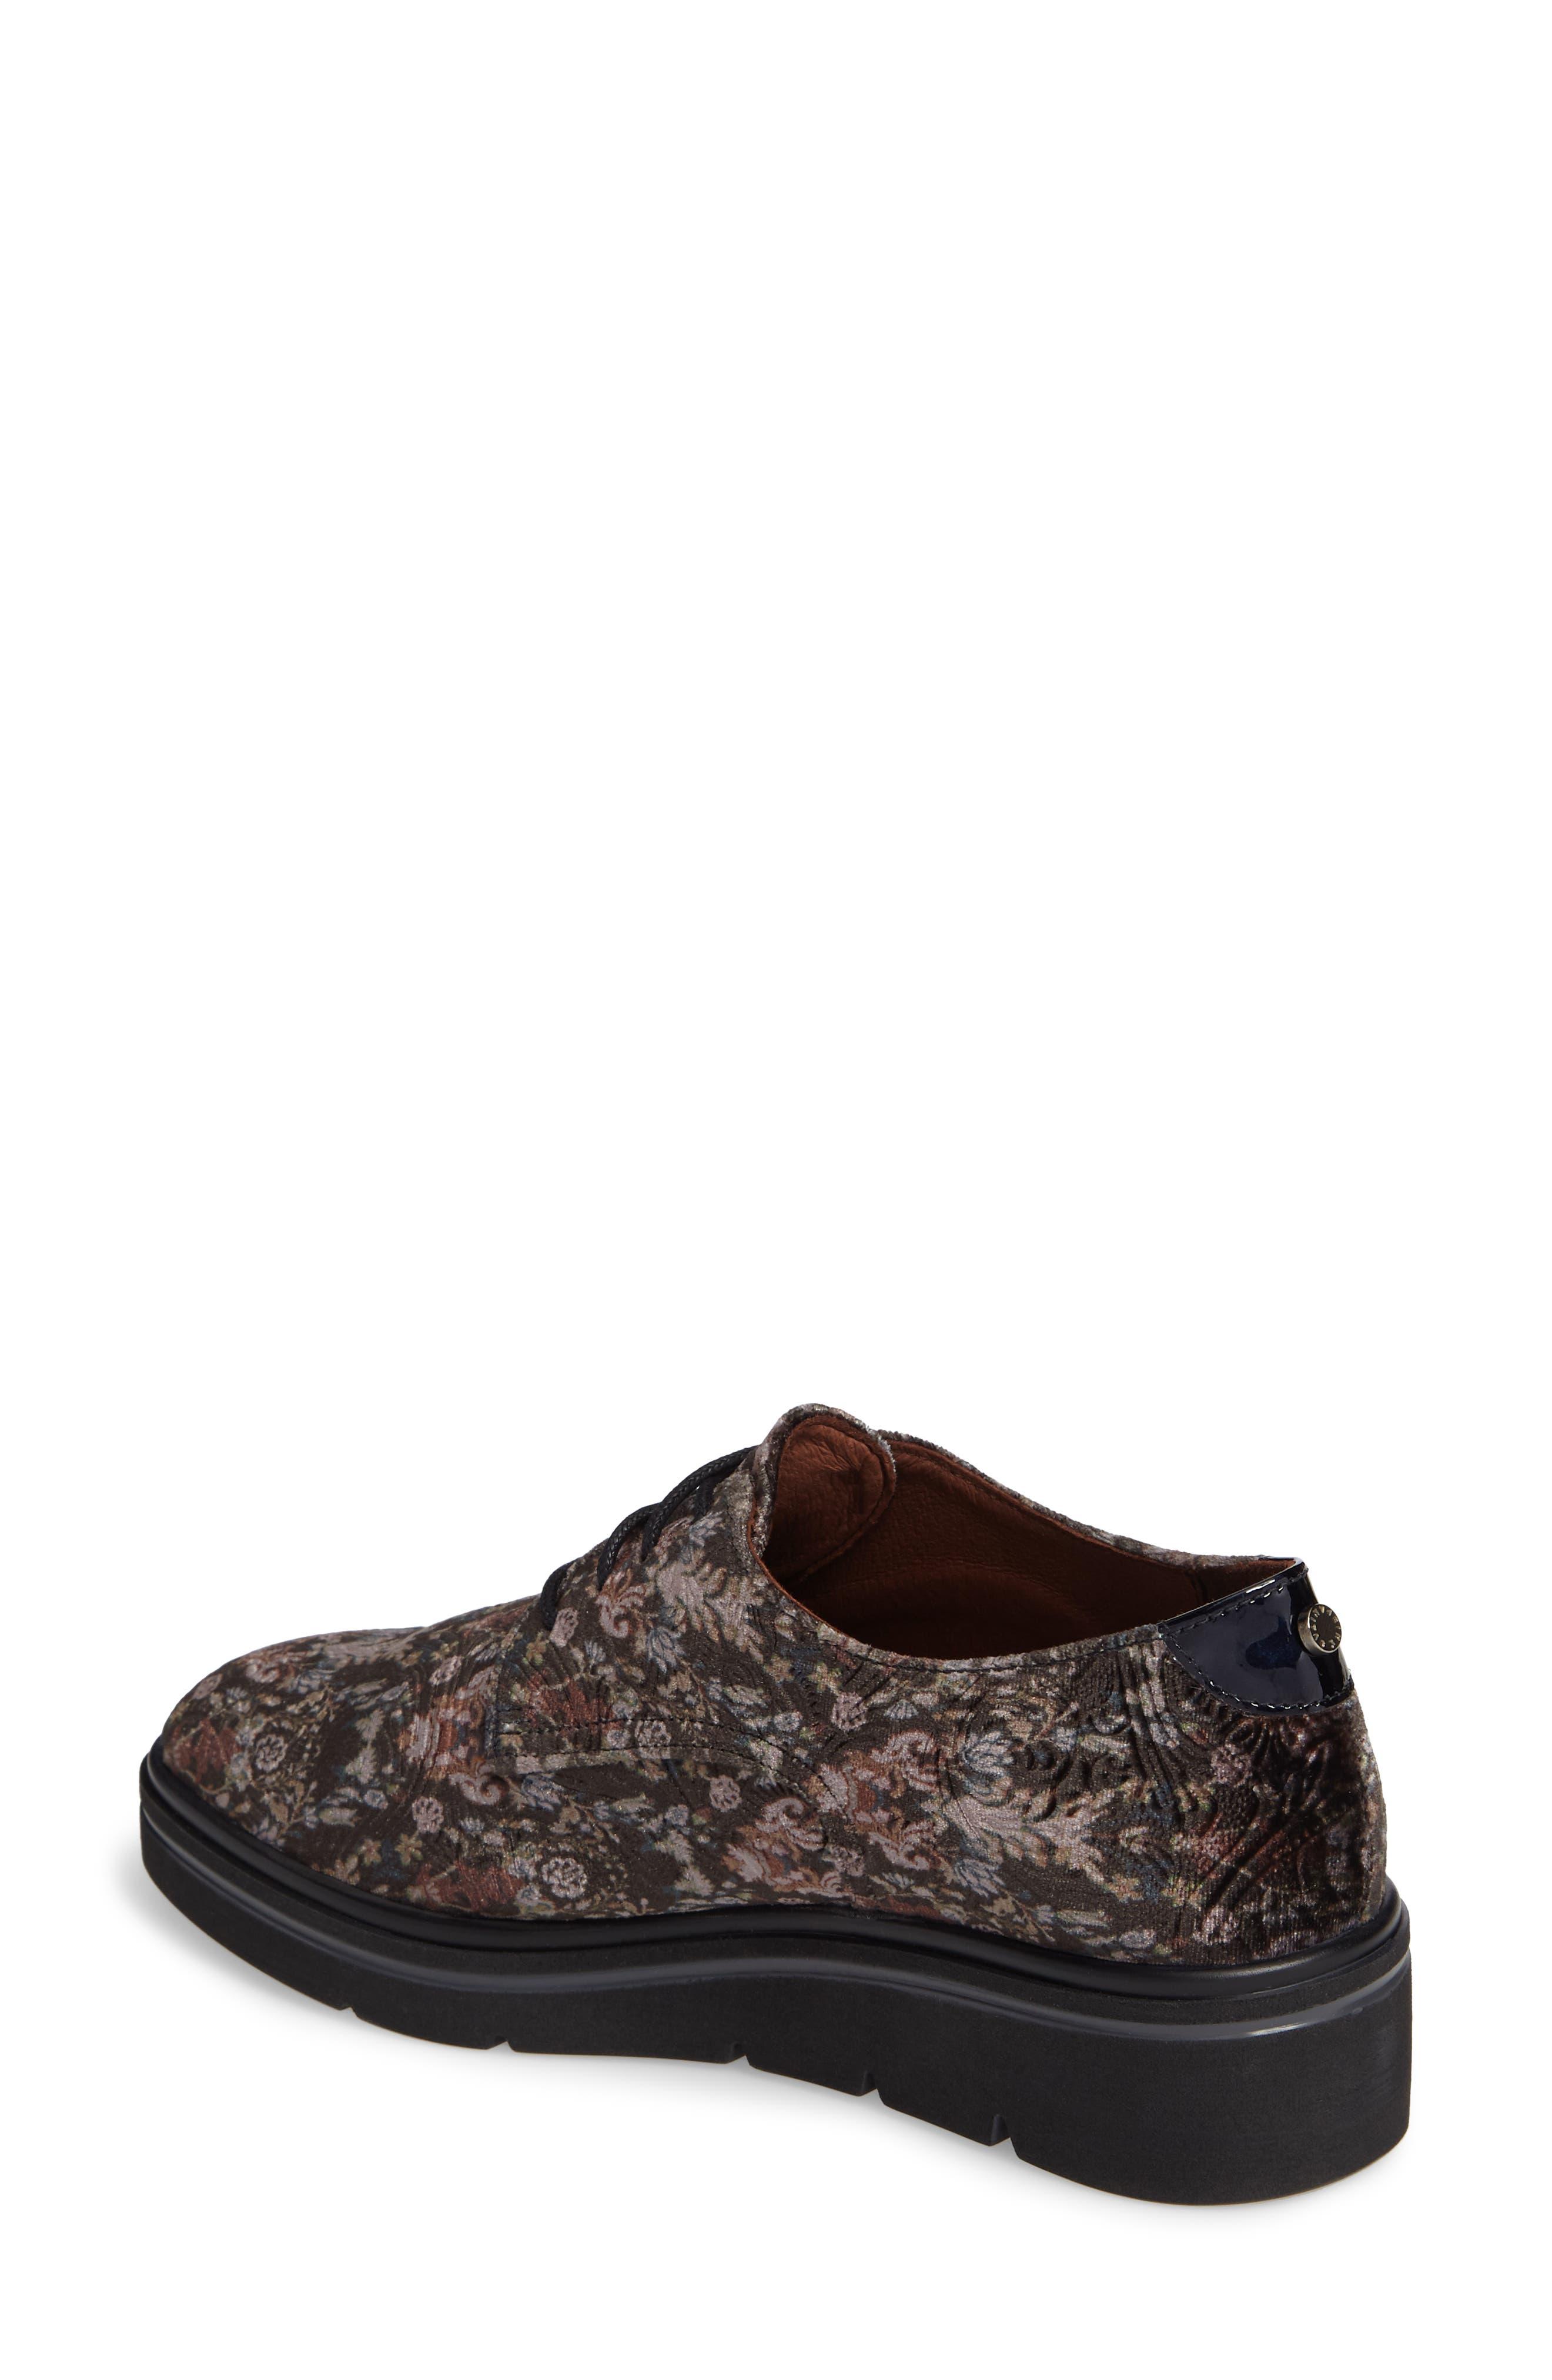 Richelle Oxford Sneaker,                             Alternate thumbnail 2, color,                             GREY FABRIC